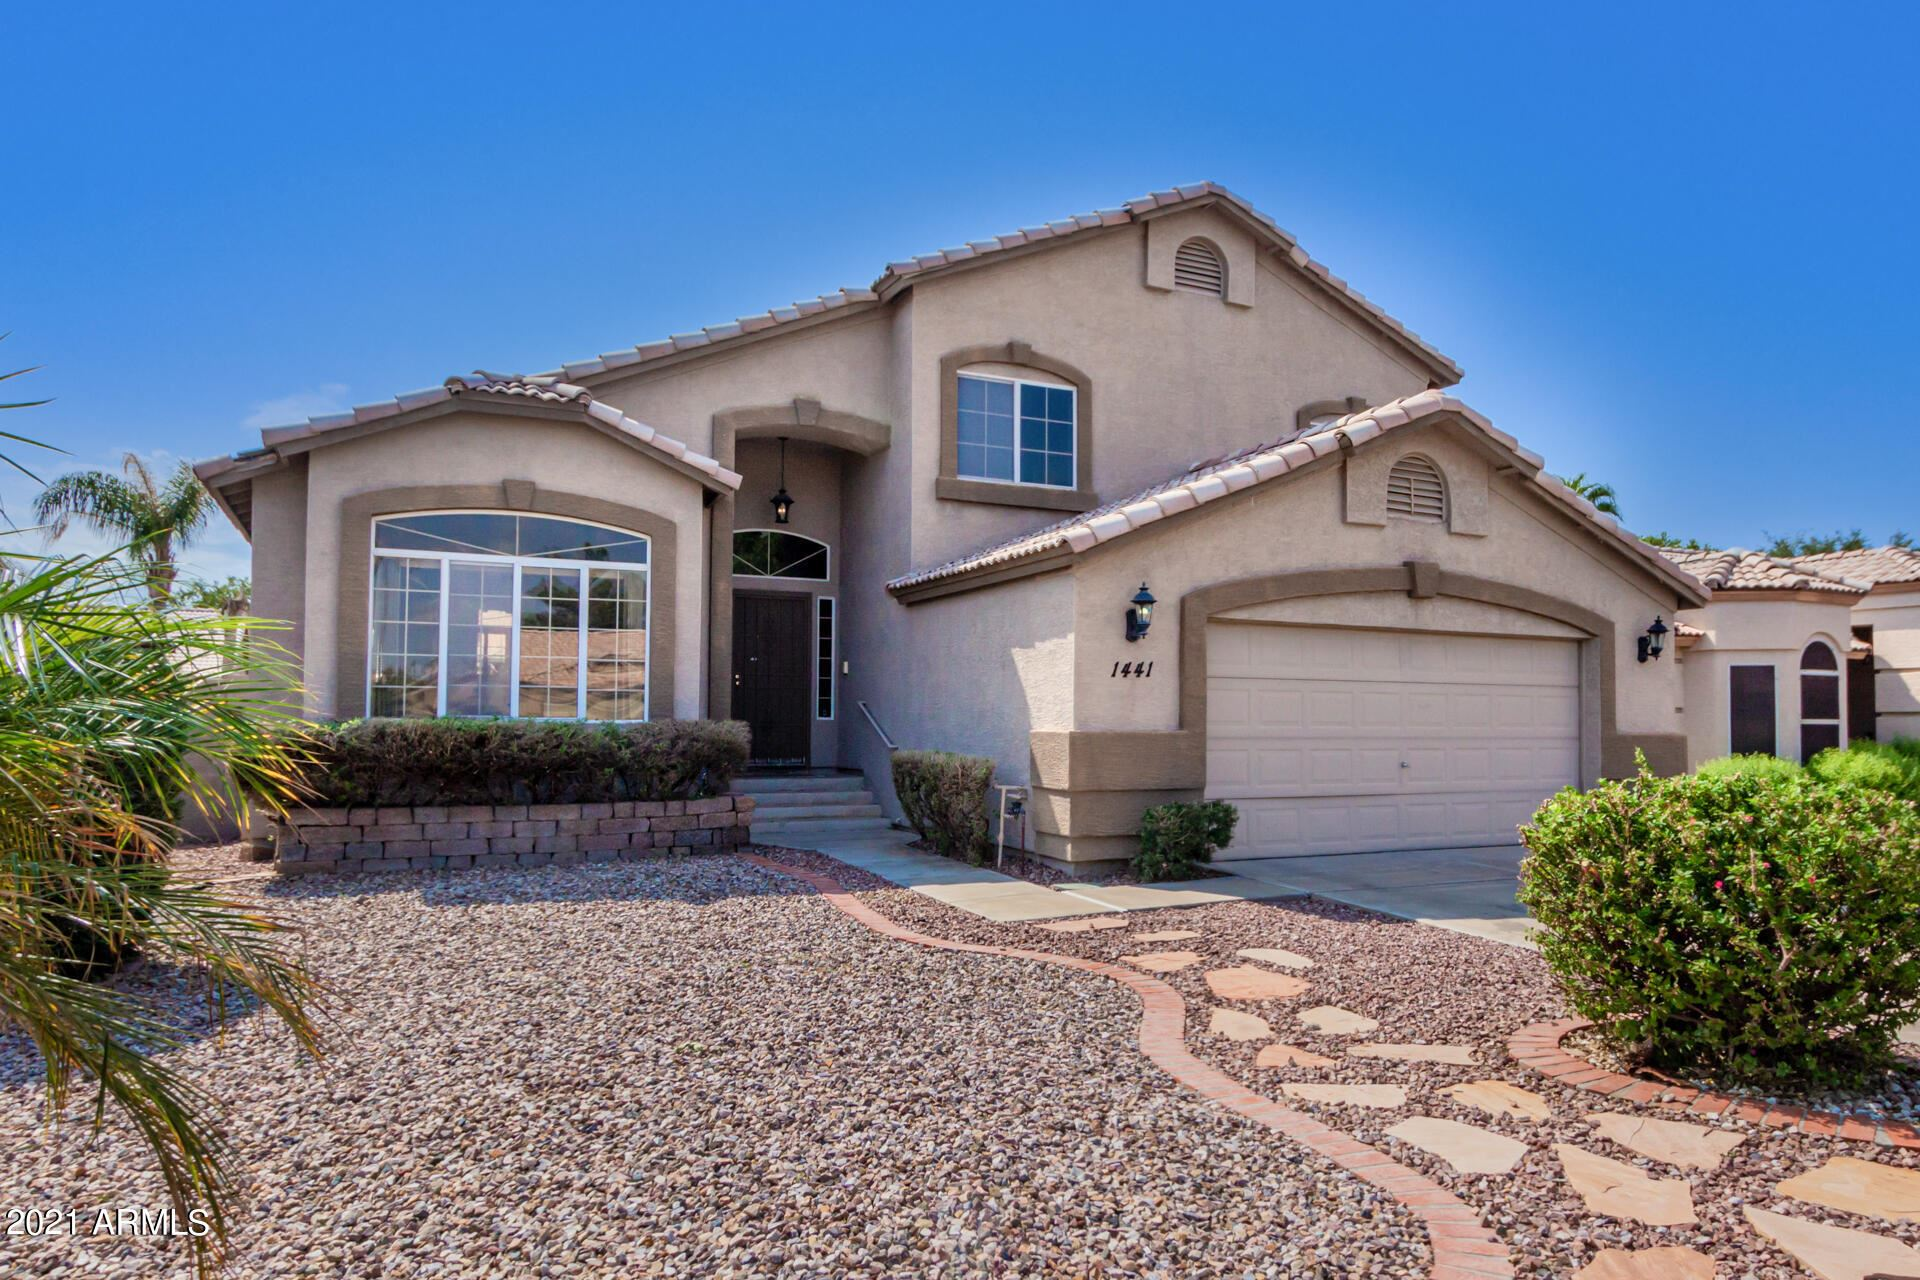 Photo of 1441 S VINE Street, Gilbert, AZ 85233 (MLS # 6294618)